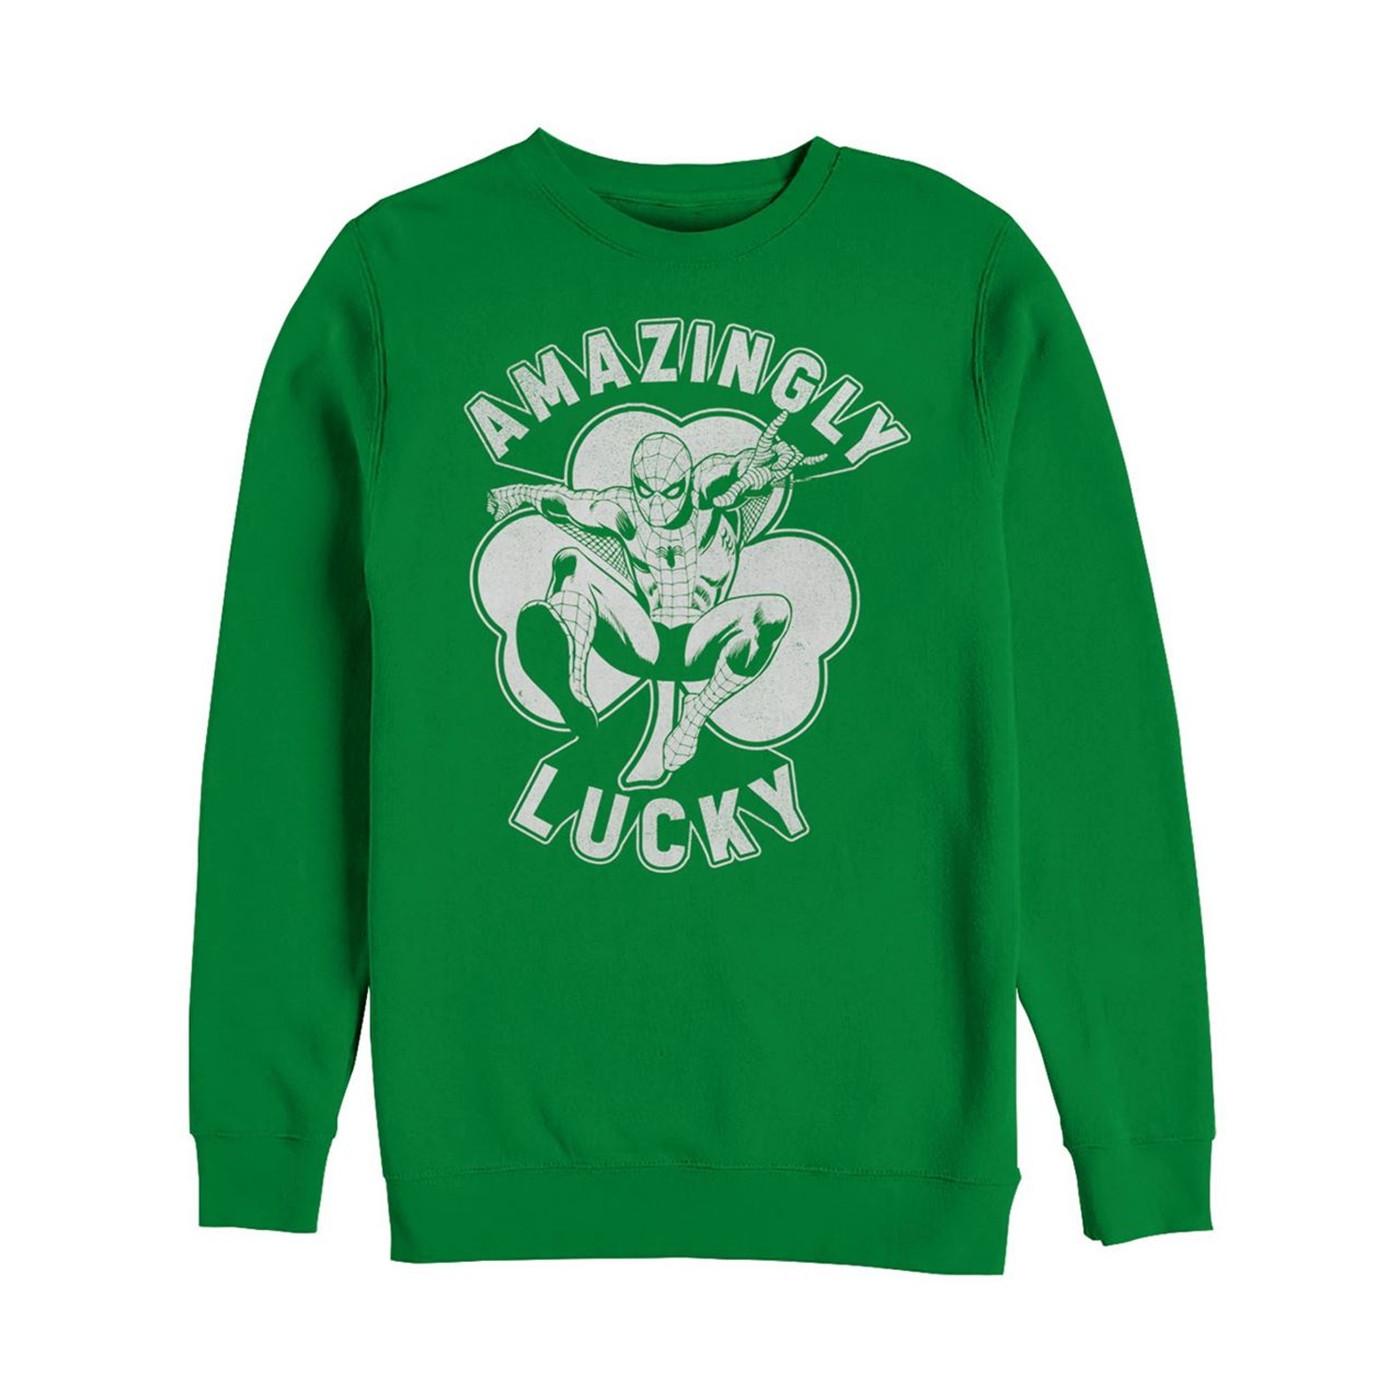 Spider-Man Amazingly Lucky St Patrick's Day Crewneck Sweatshirt